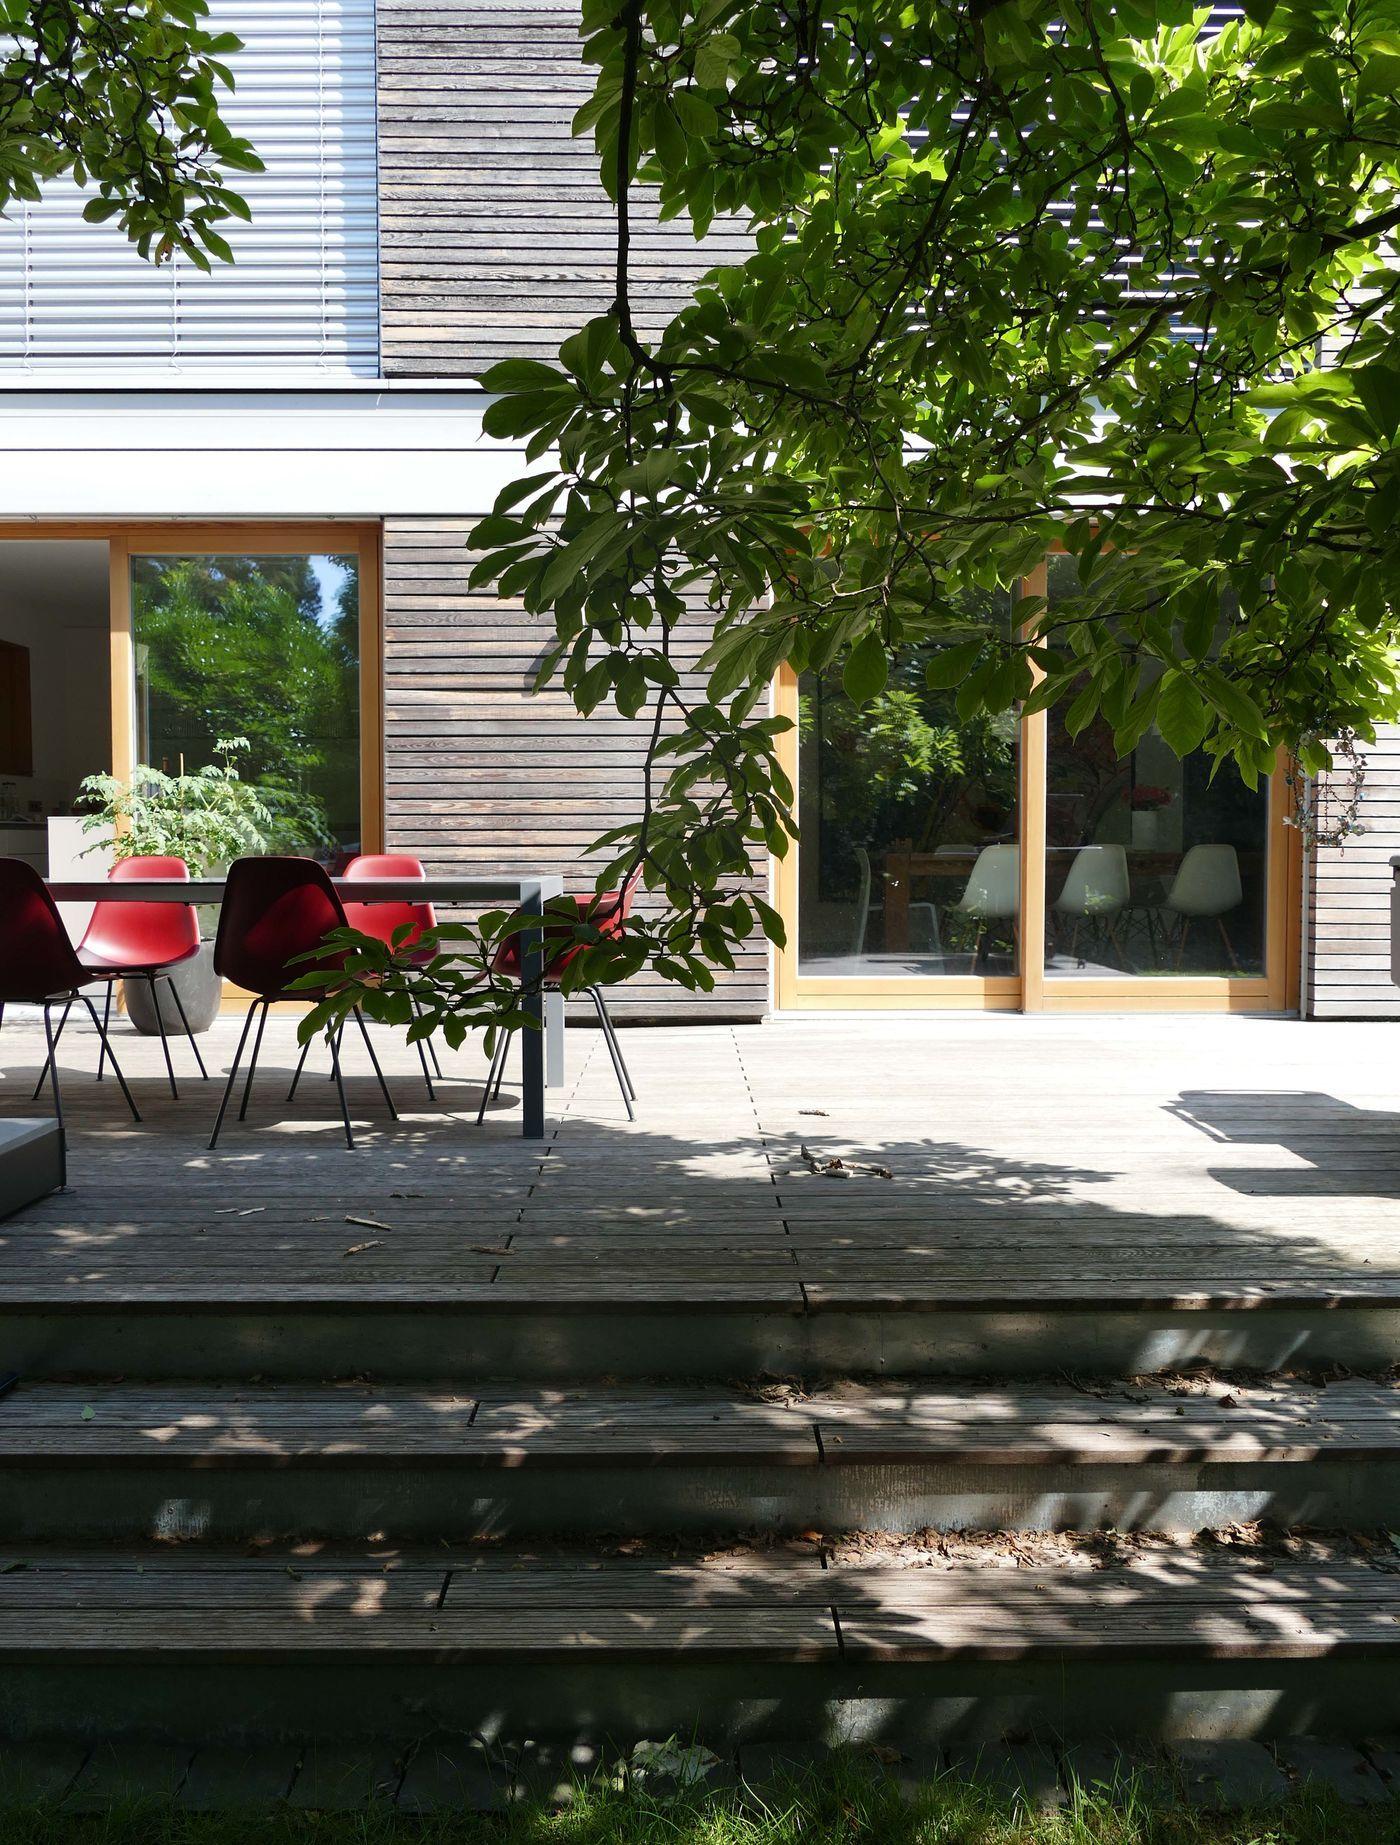 gartengestaltung ideen bilder. Black Bedroom Furniture Sets. Home Design Ideas